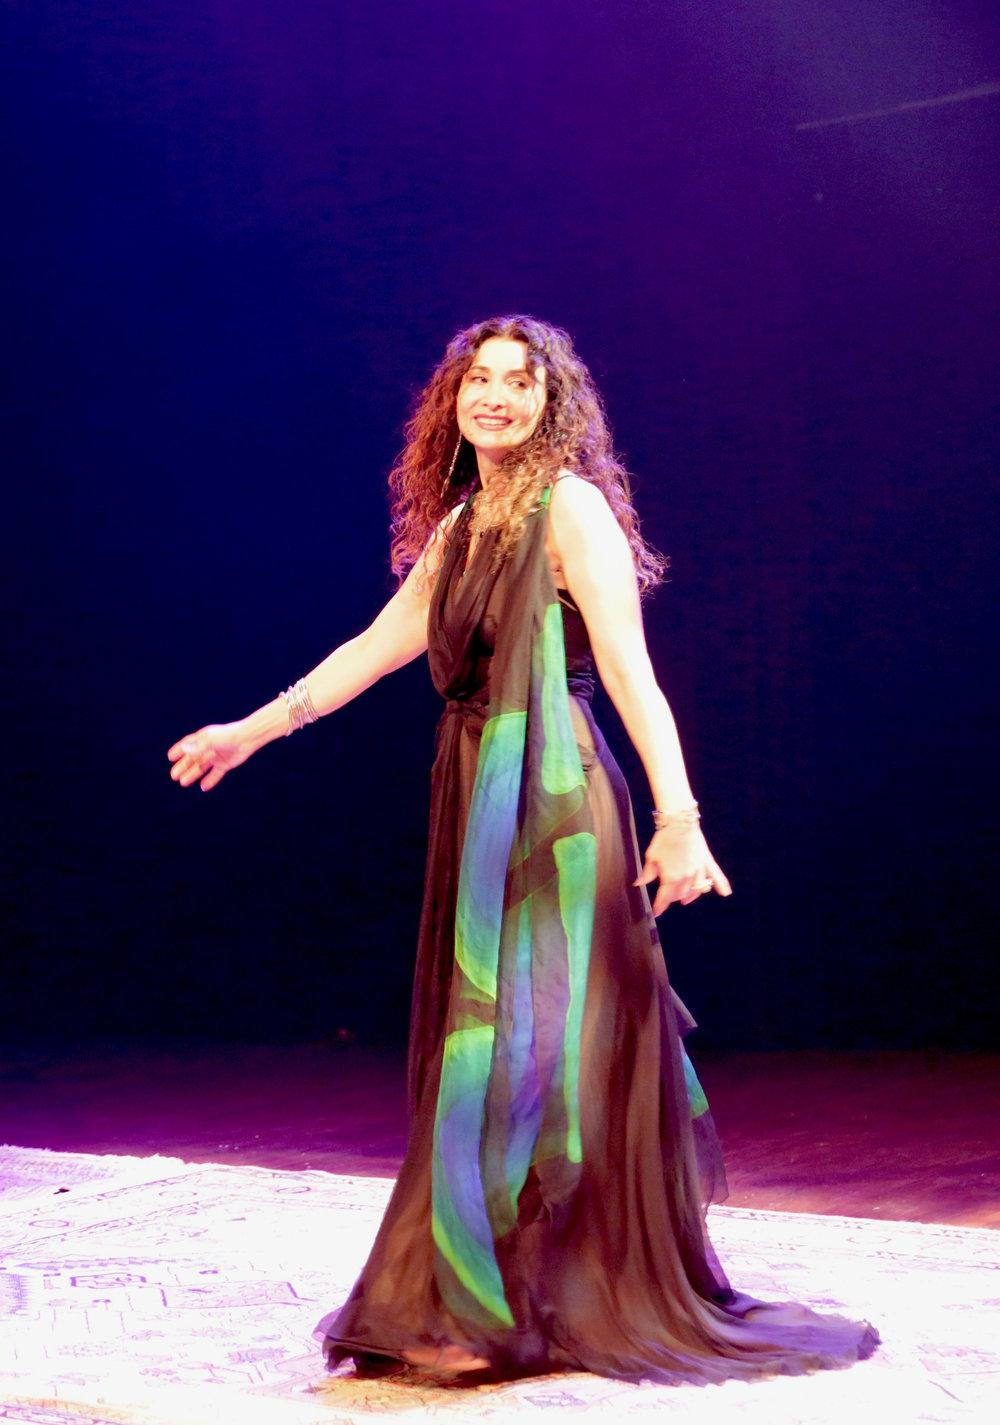 Sholeh Wolpé in performance, Sydney, Australia 2018